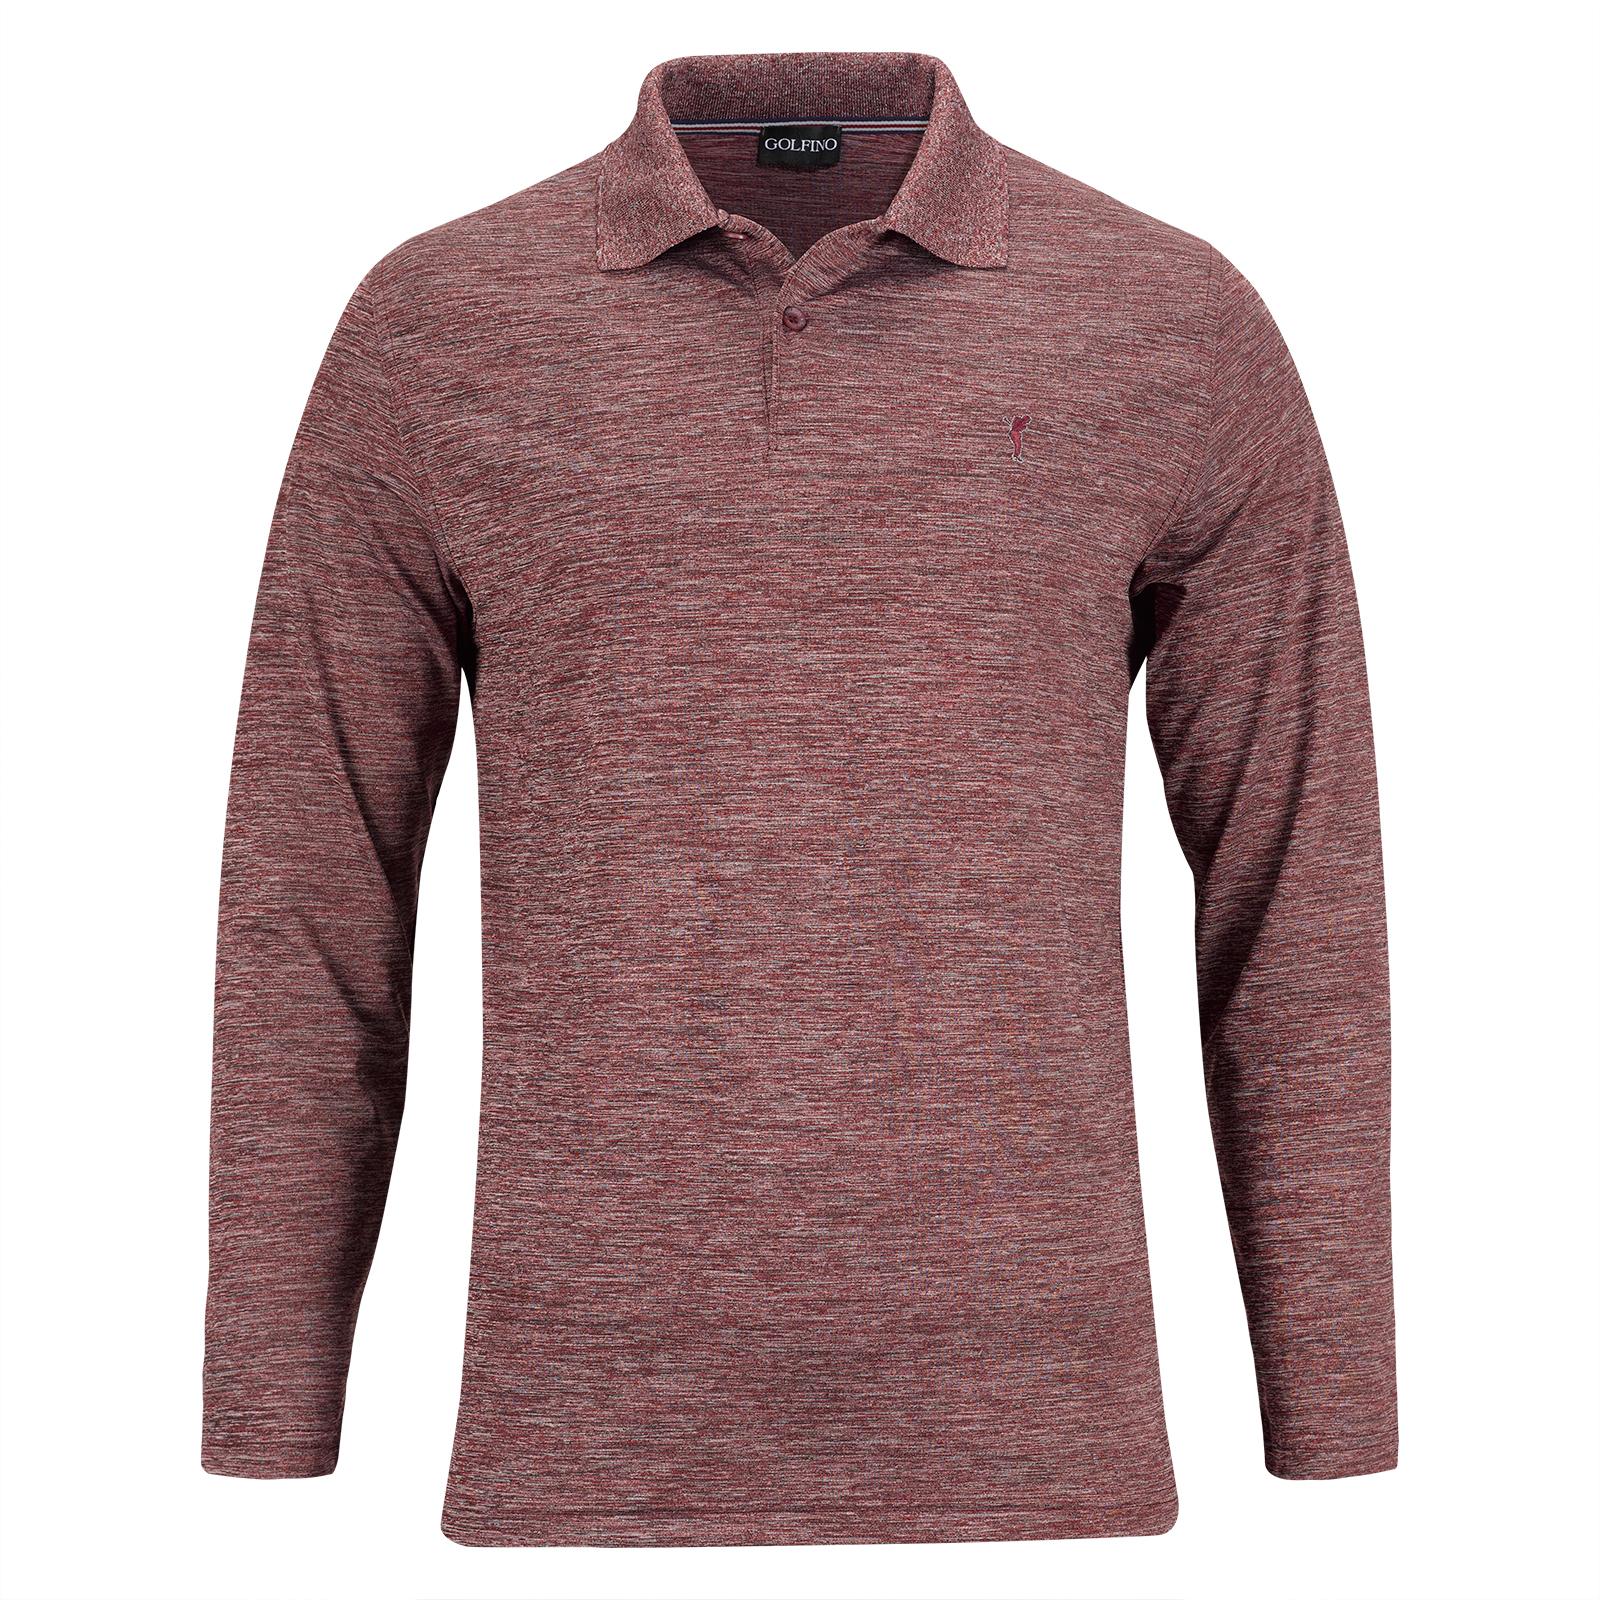 848d95c5ece827 GOLFINO Men's long-sleeve golf Resort Wear in regular fit shop online |  Golfino